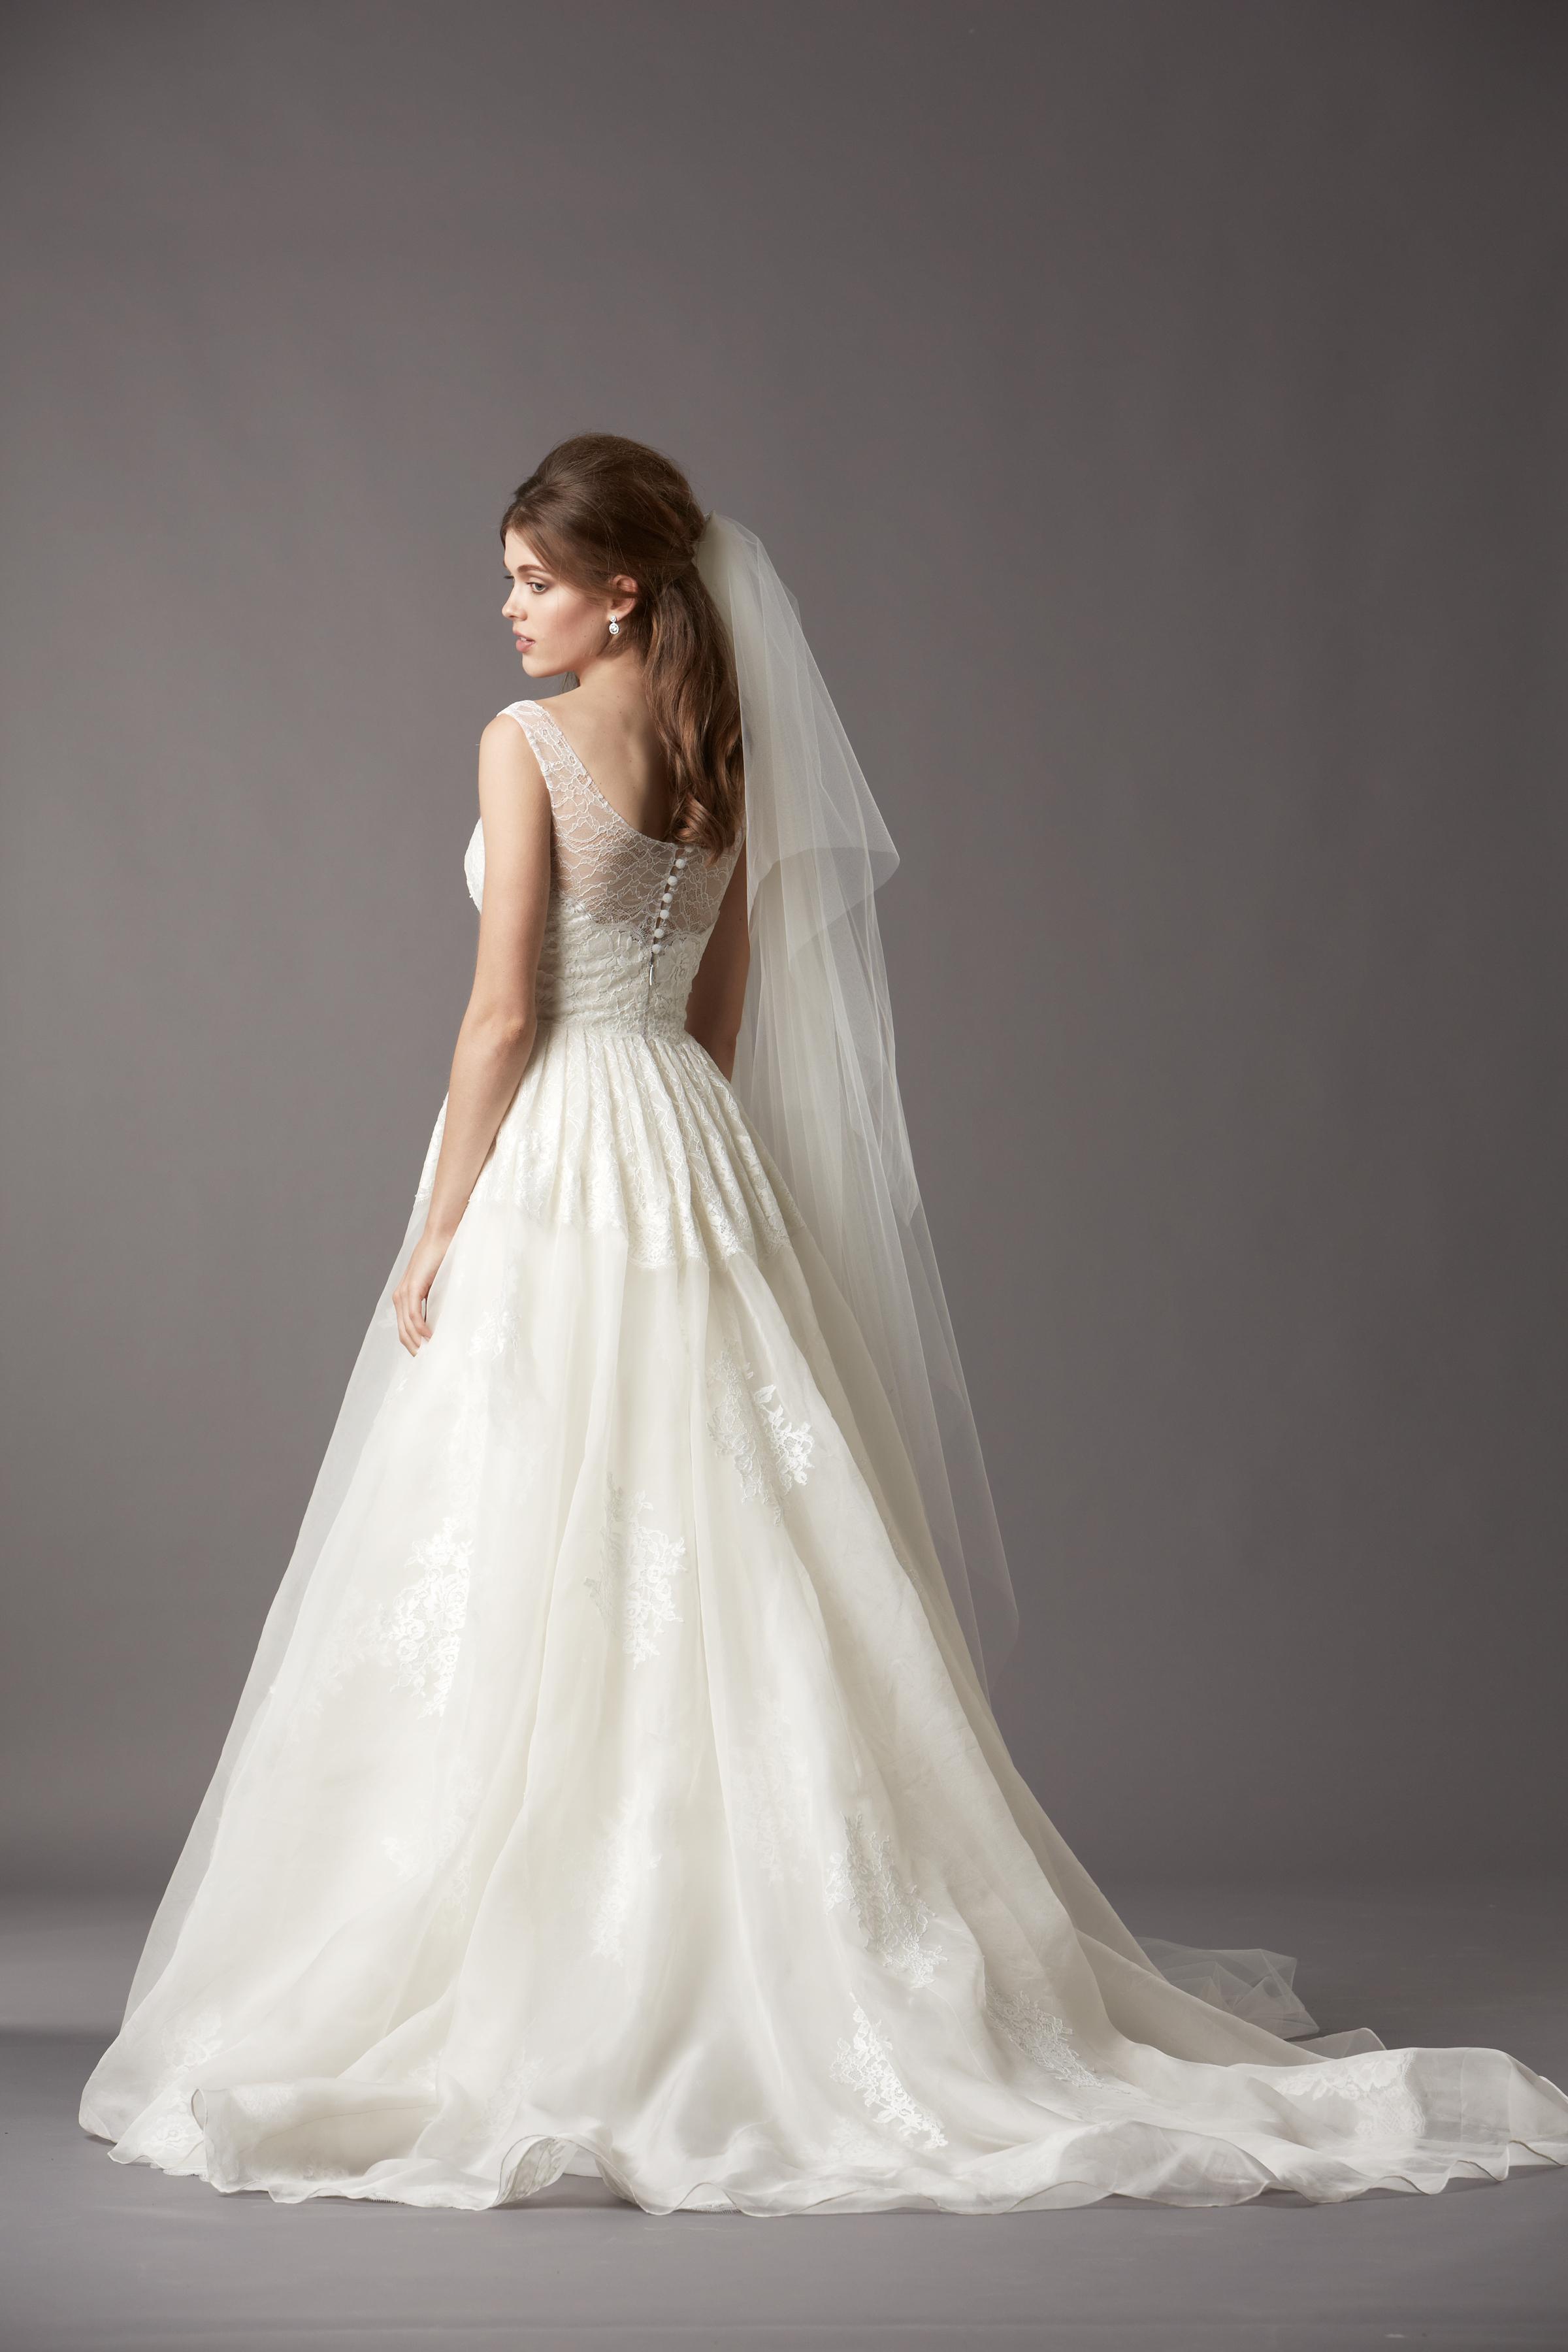 Watters bridal gowns fall 2013 wedding dress 4072b for Watters wtoo wedding dresses